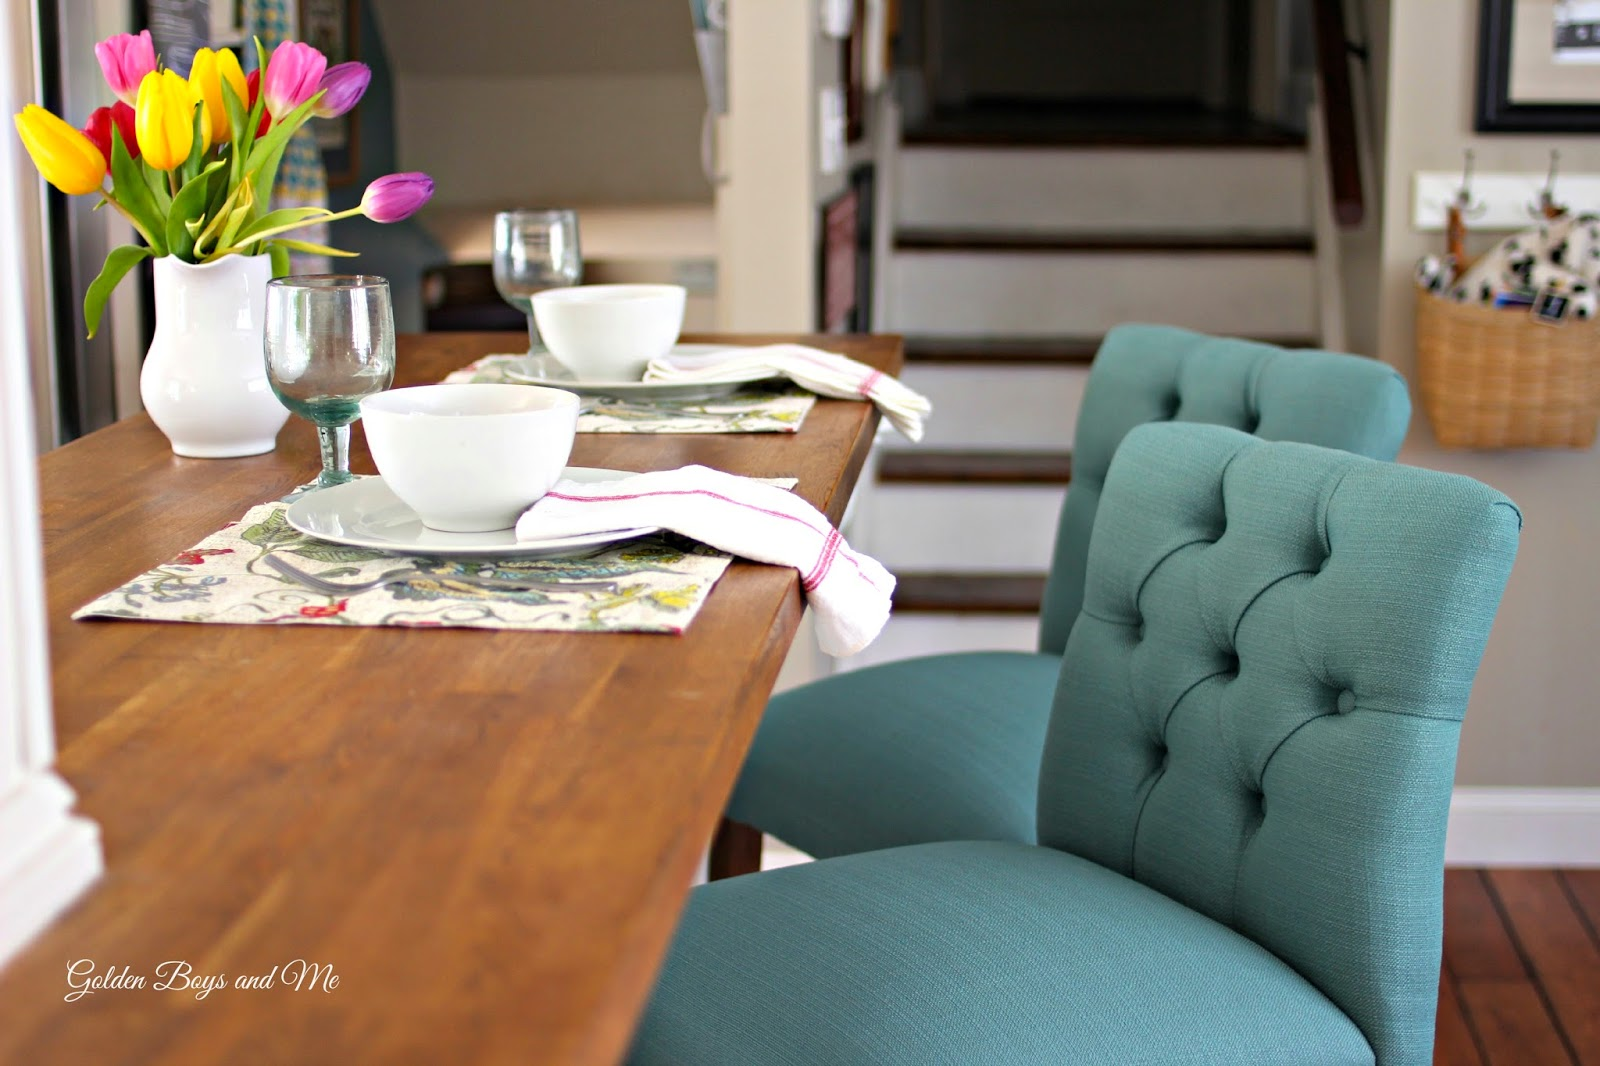 Target threshold bar stools in kitchen at butcher block island-www.goldenboysandme.com